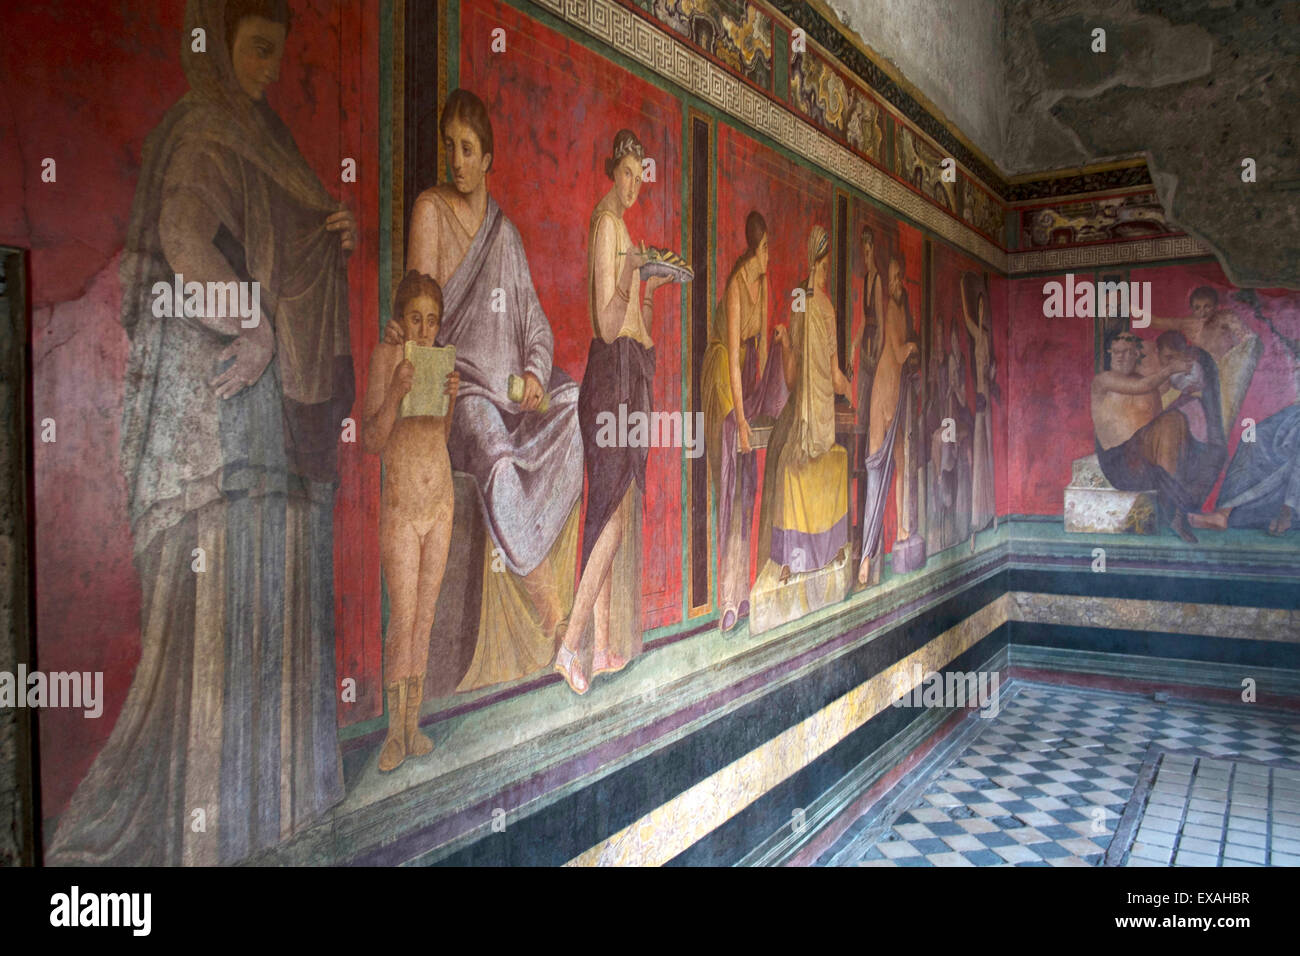 In the Triclinium, Villa dei Misteri, Pompeii, UNESCO World Heritage Site, Campania, Italy, Europe - Stock Image